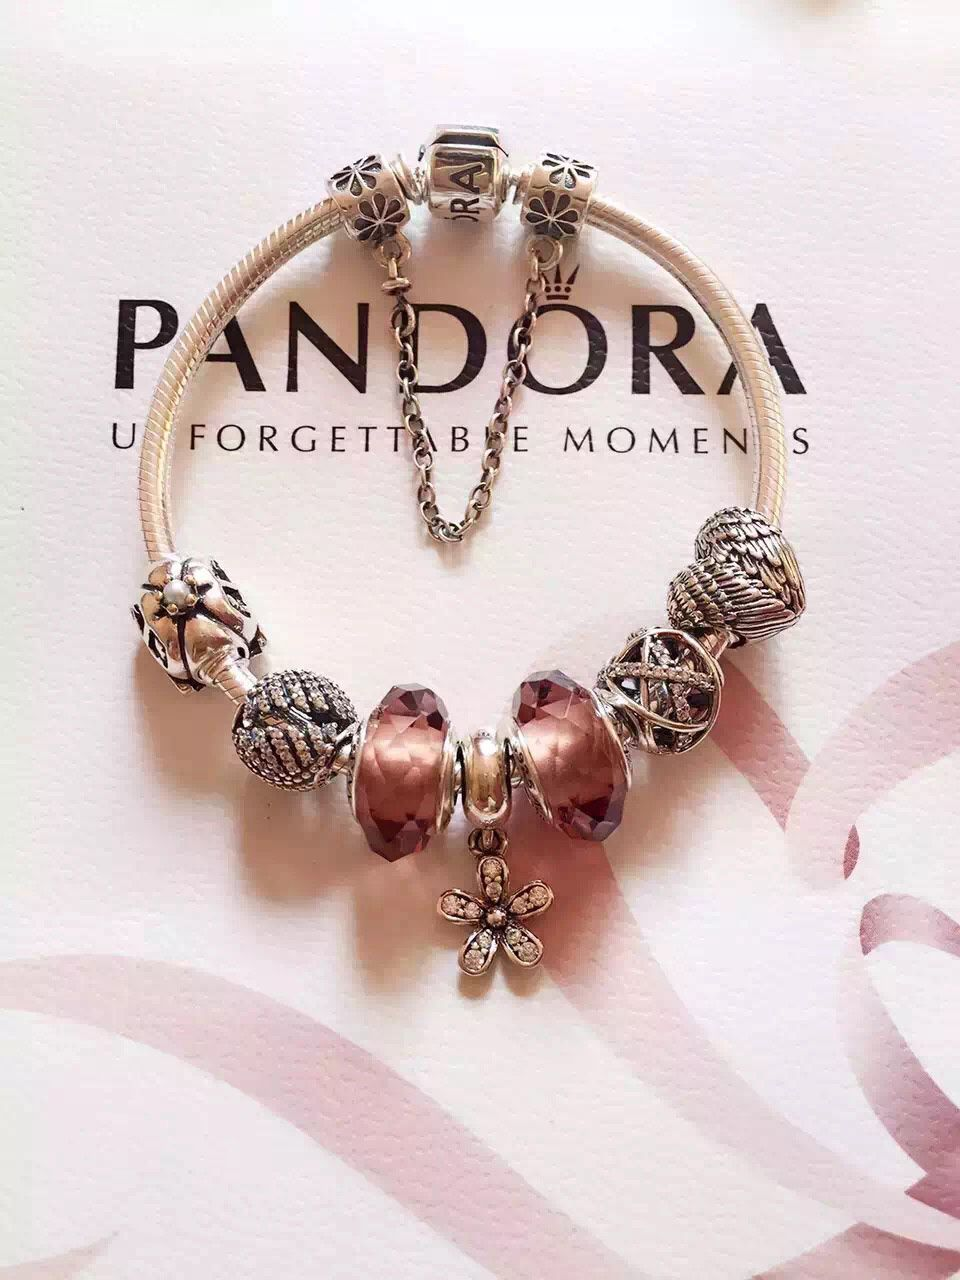 219 pandora charm bracelet pink hot sale